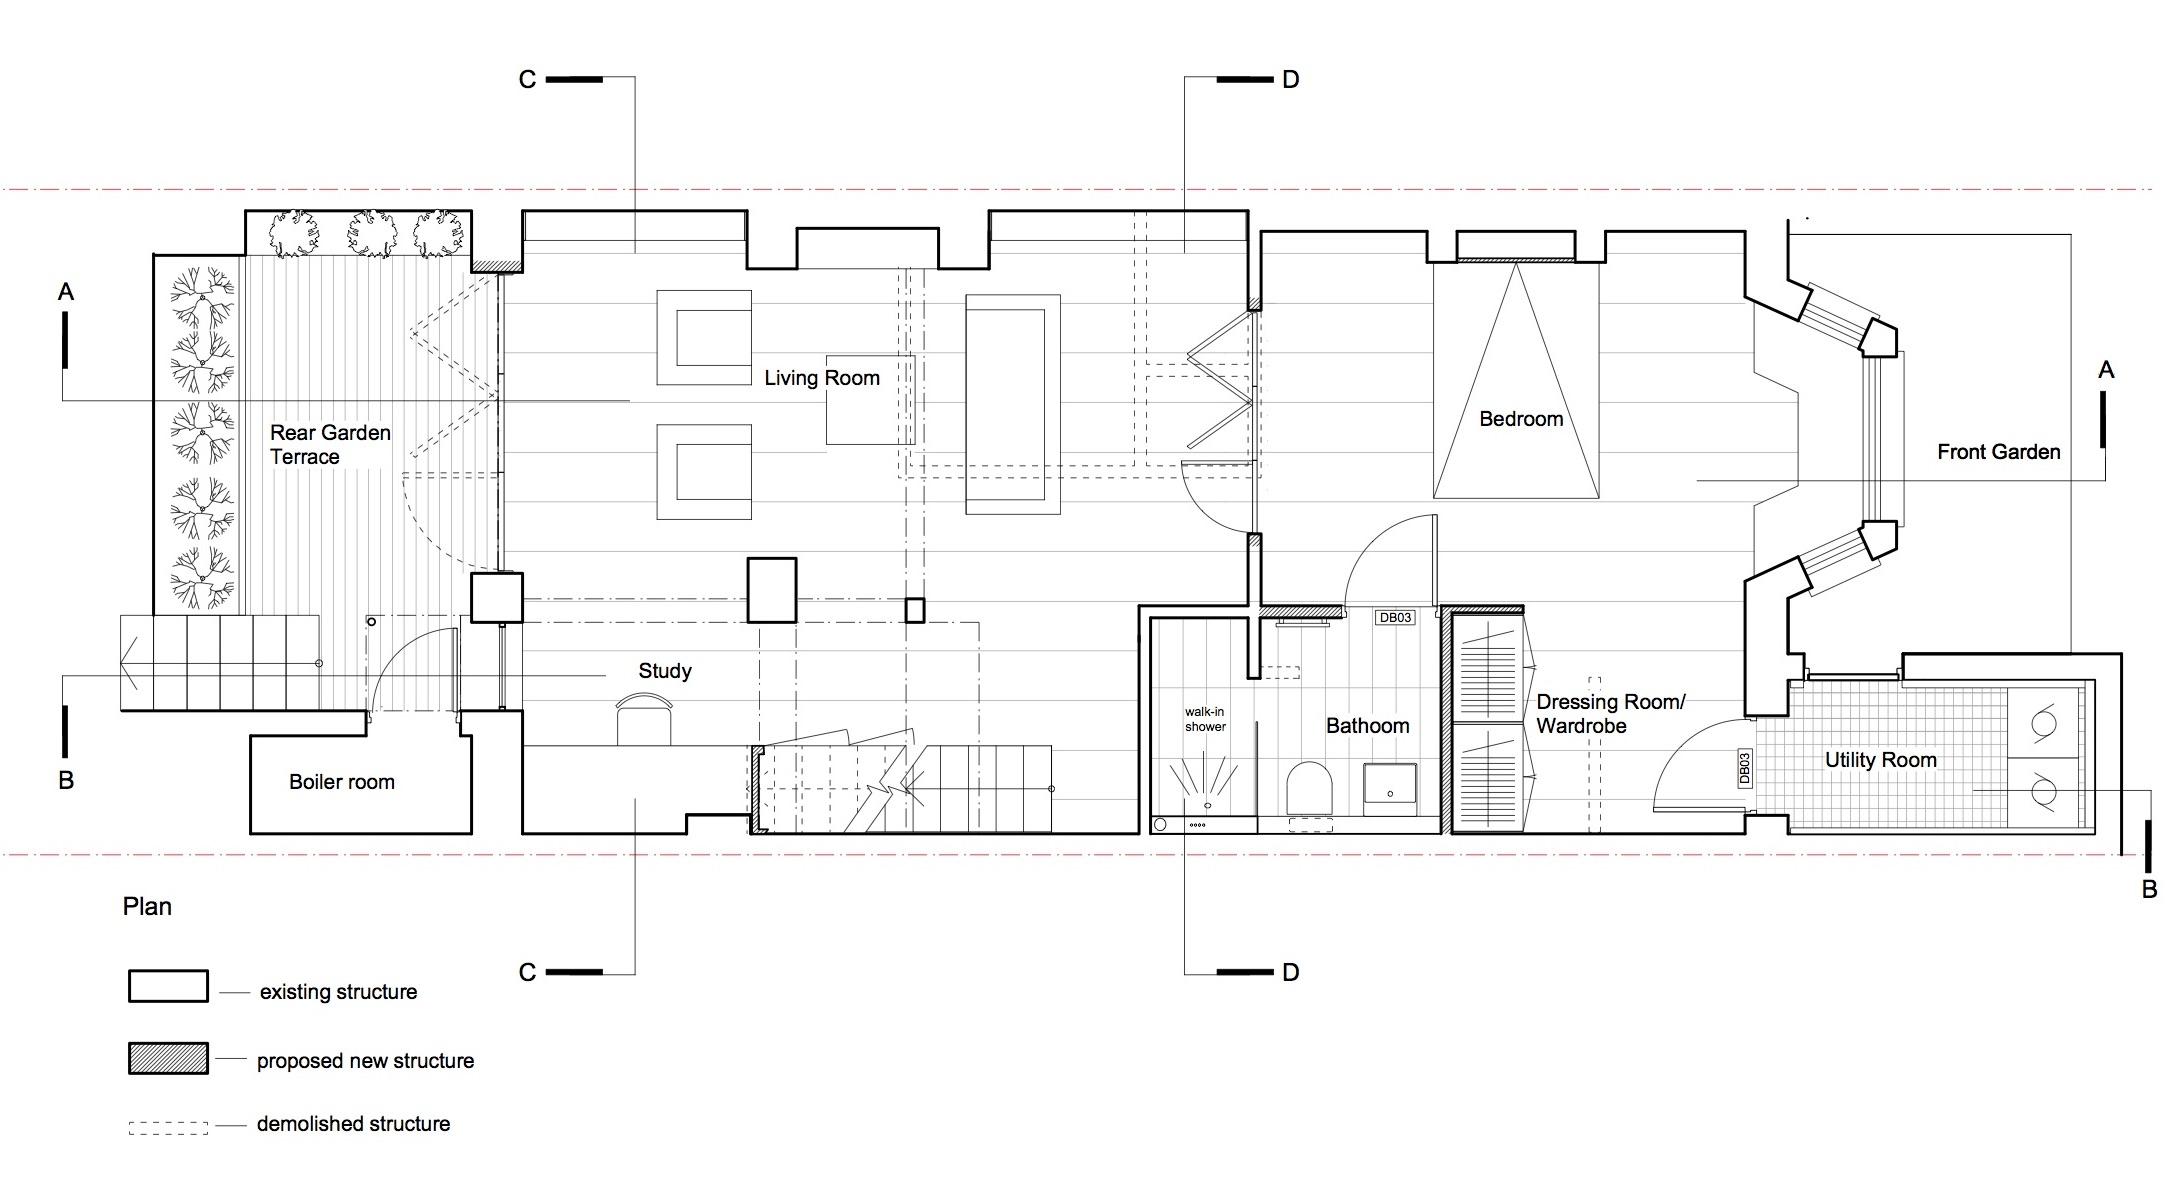 New plan layout